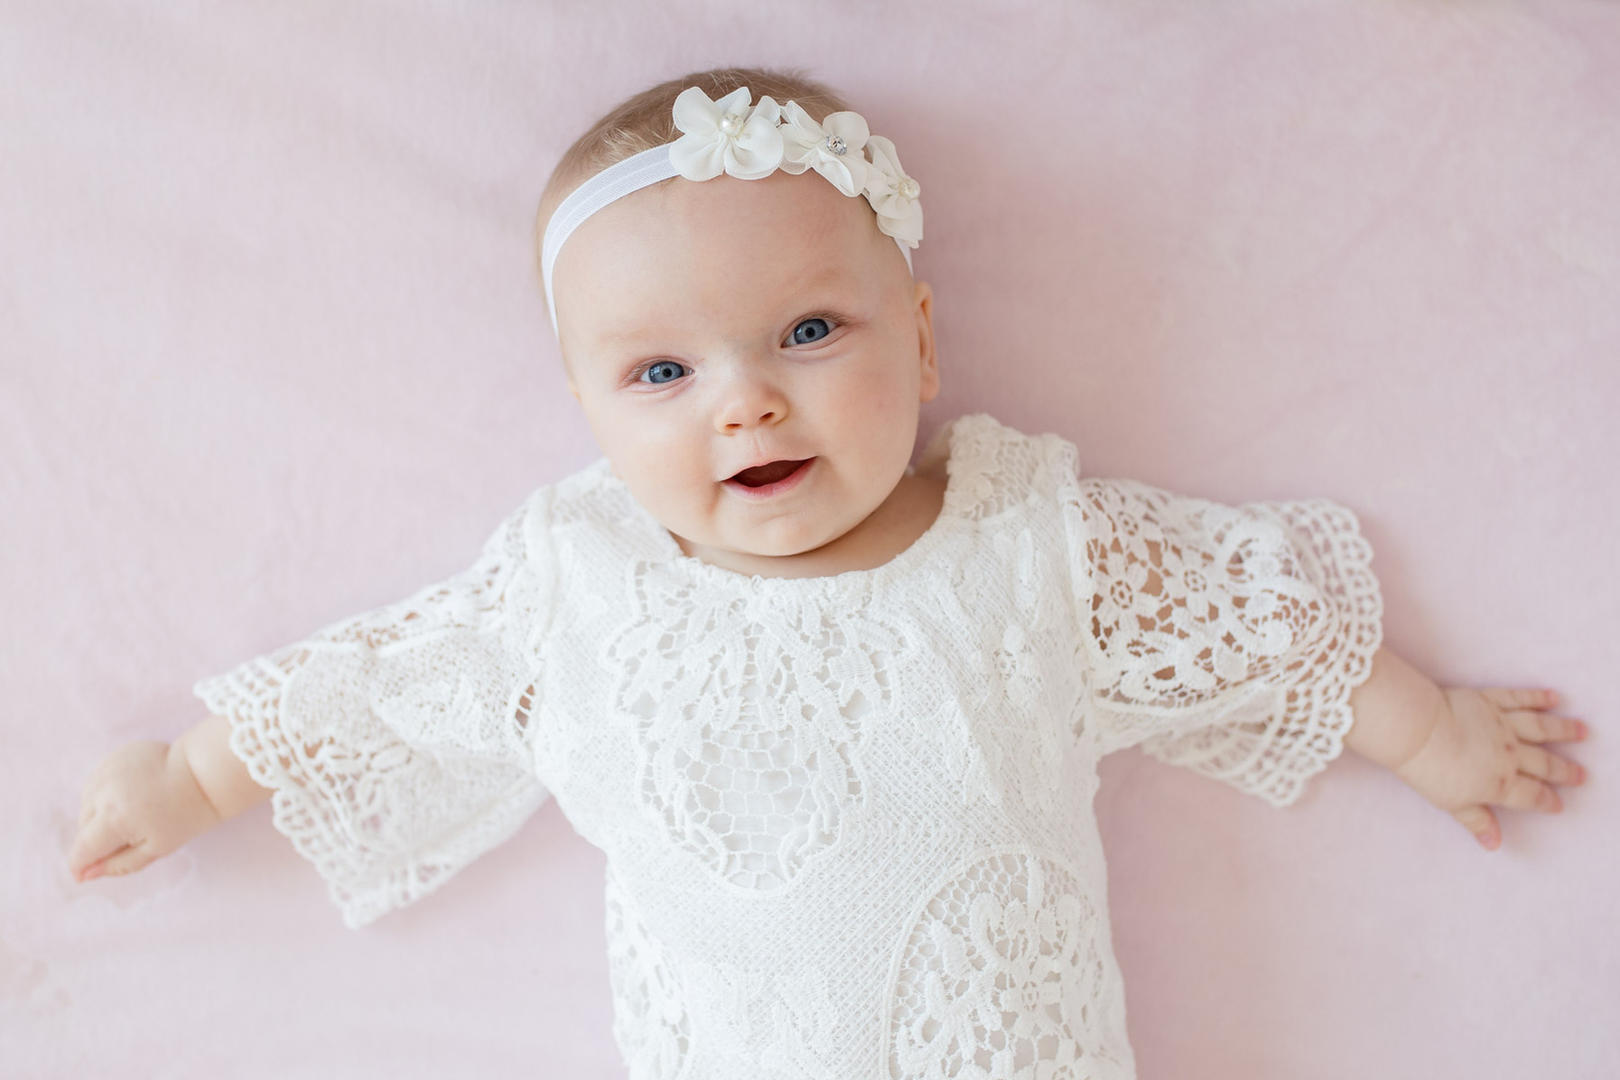 fletkefoto family and newborn baby photography shoot